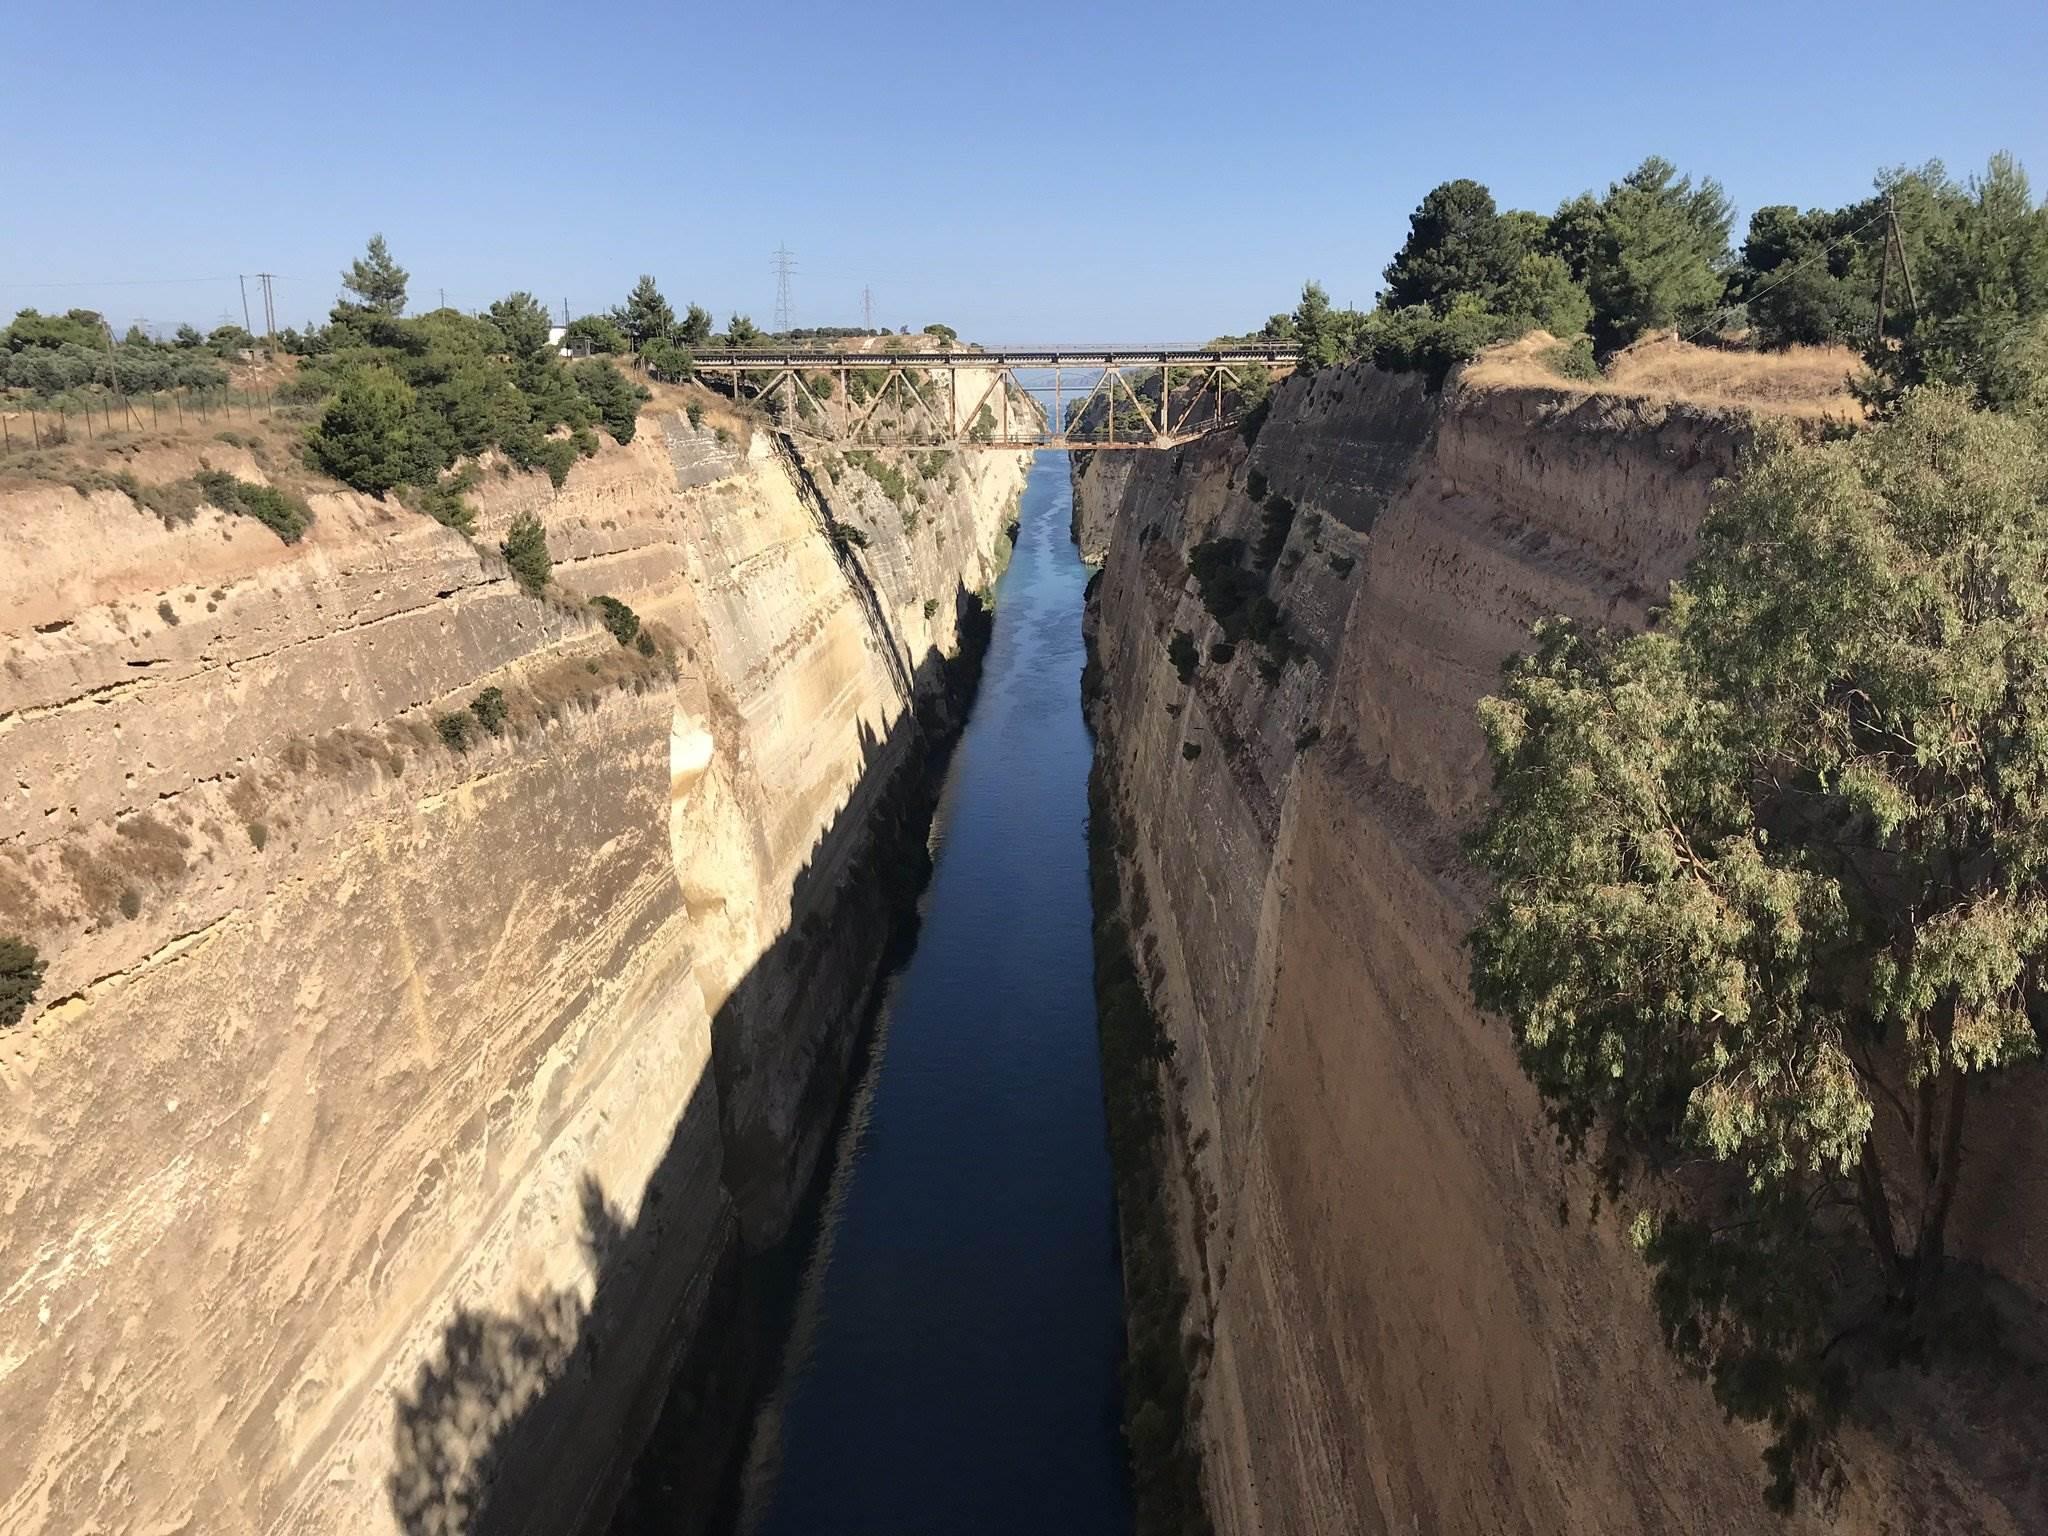 greece canal